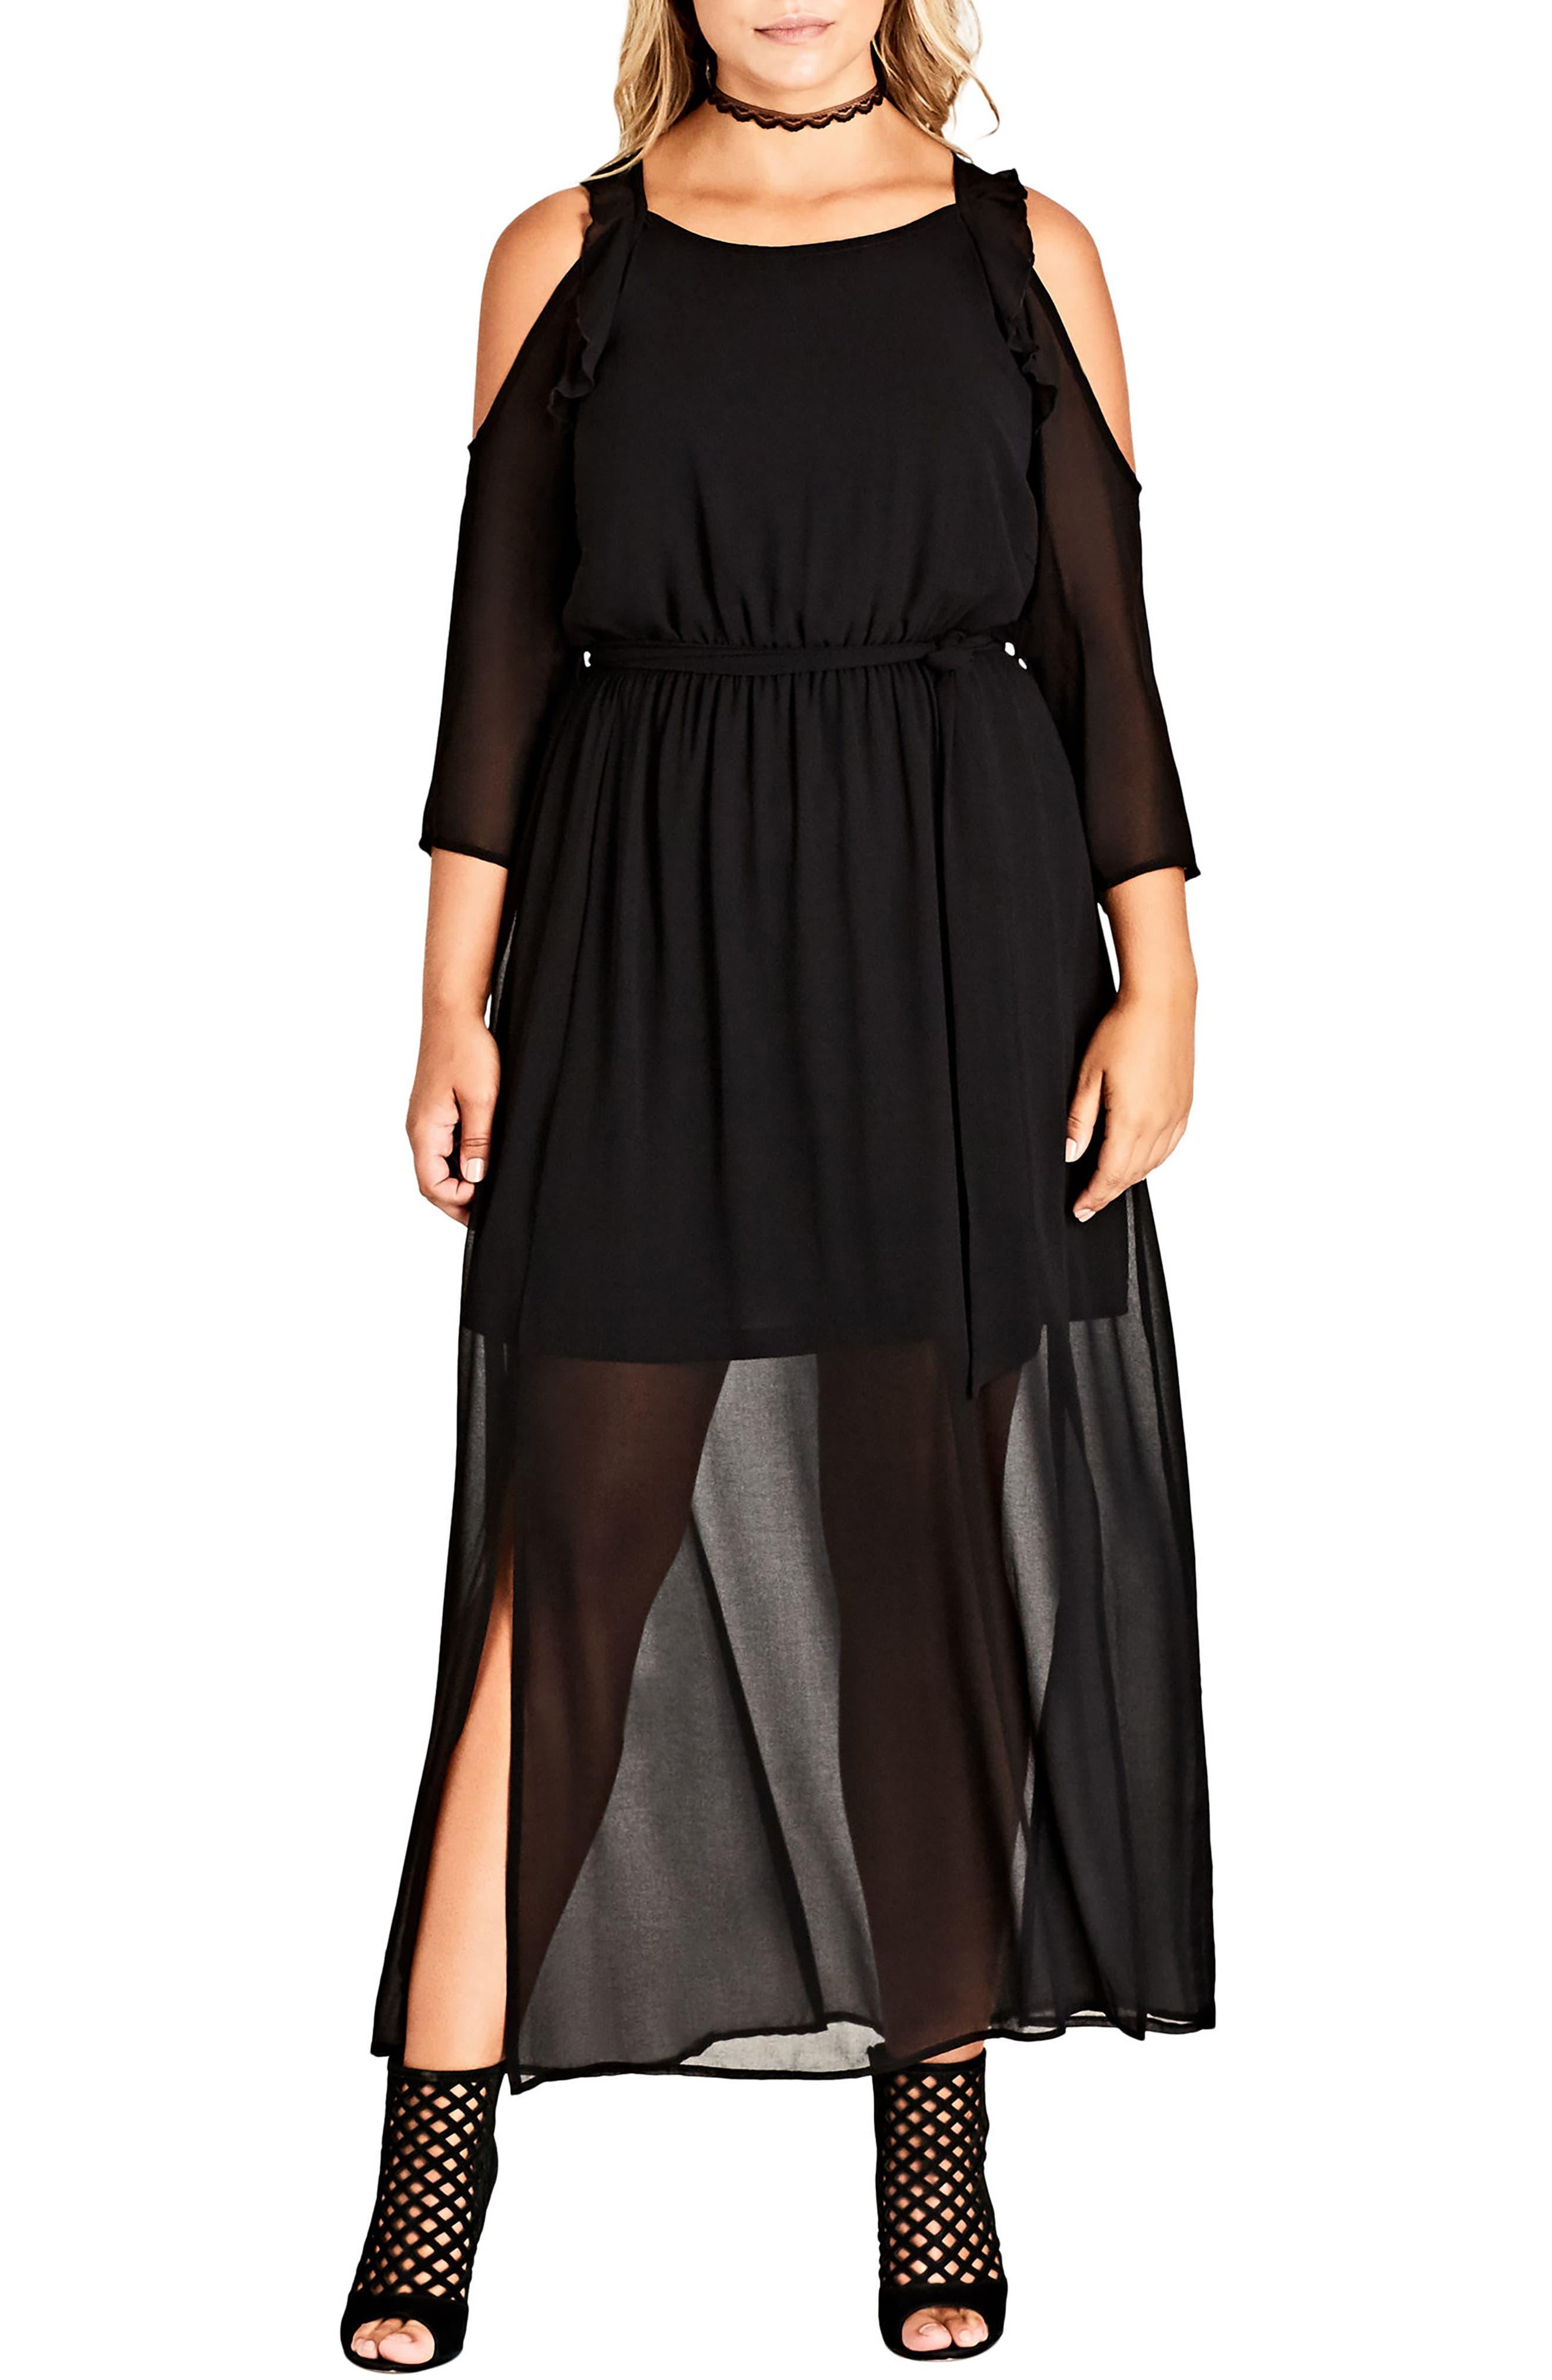 CITY CHIC Cold Shoulder Maxi Dress